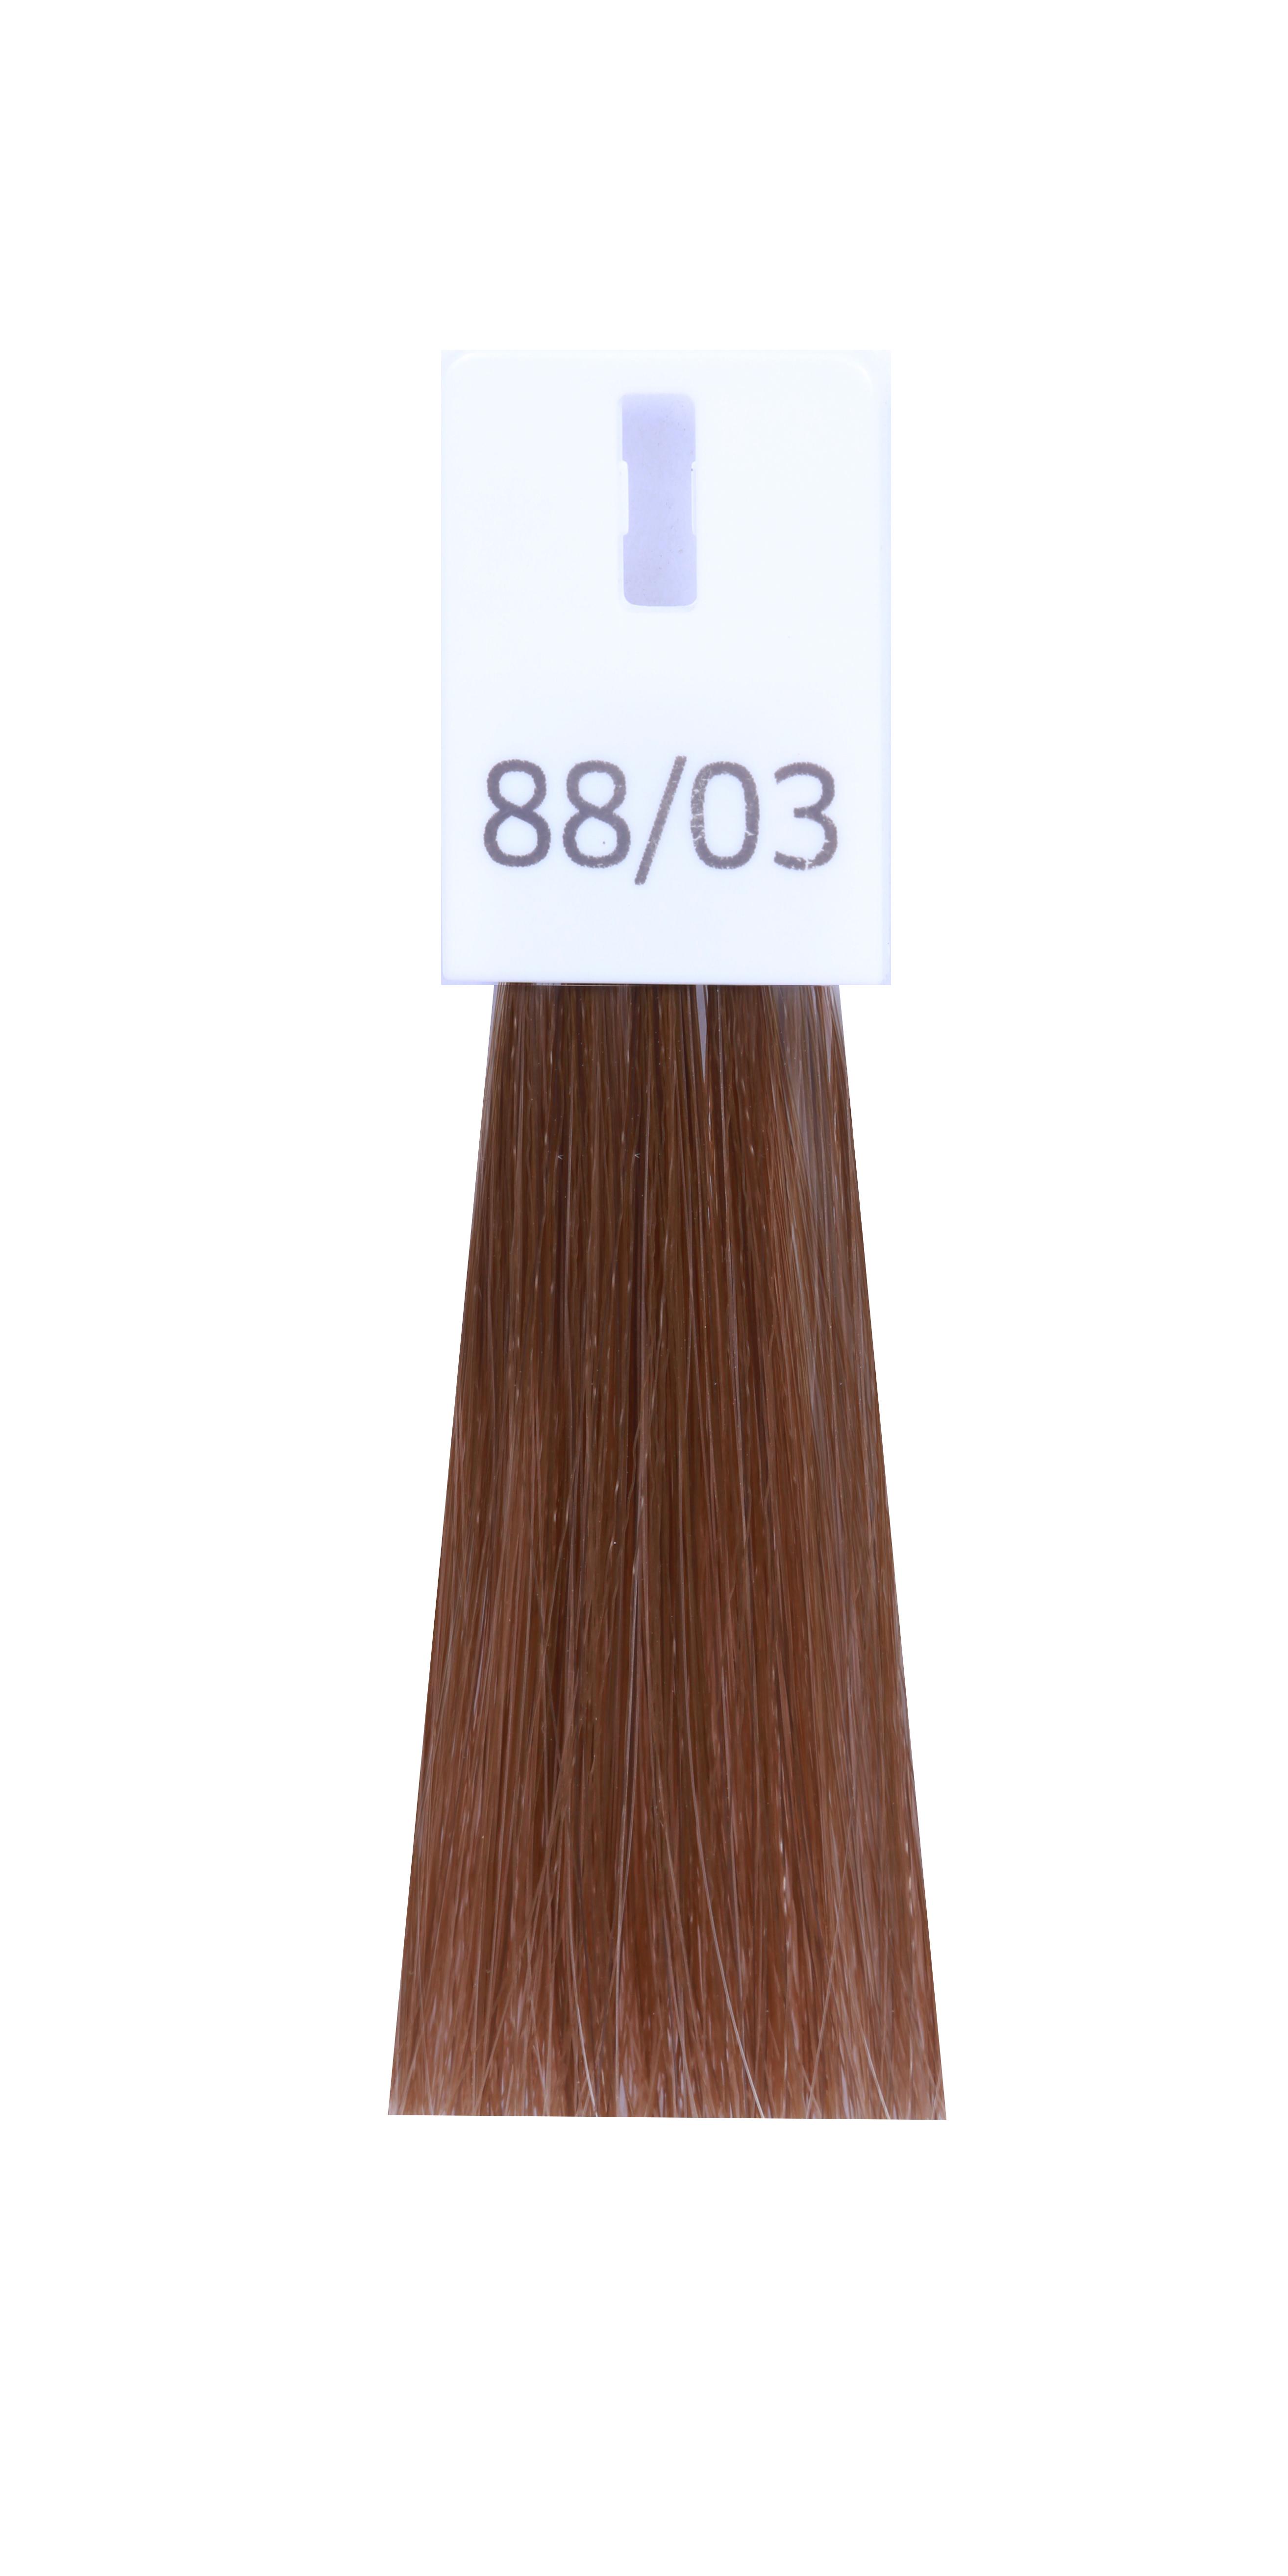 WELLA PROFESSIONALS 88/03 краска для волос имбирь / Color Touch Plus 60 мл.